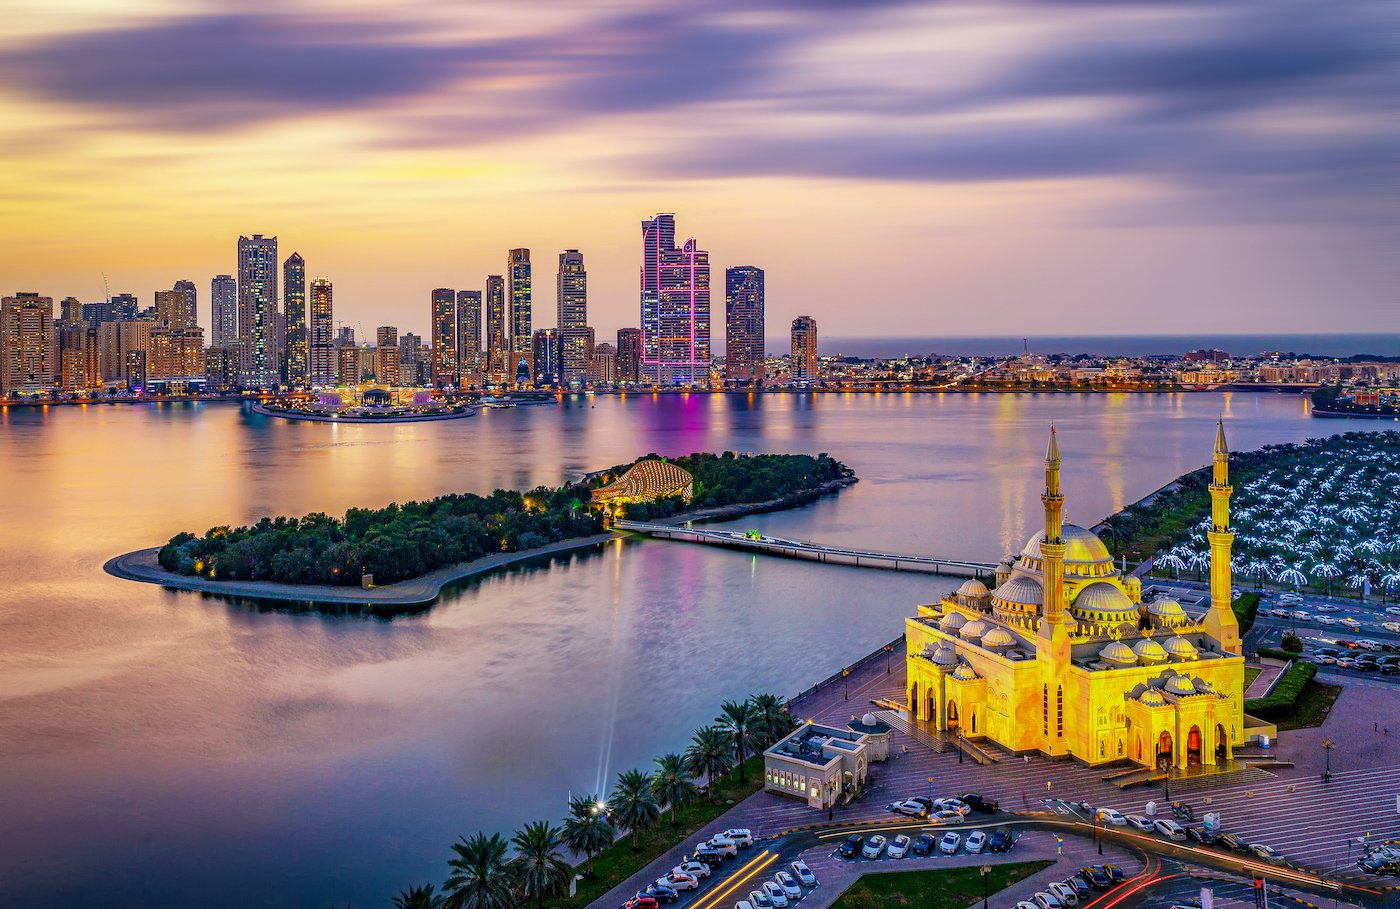 See Sharjah On Our 7 Day Dubai, Abu Dhabi, Sharjah & Ajman Tour Package